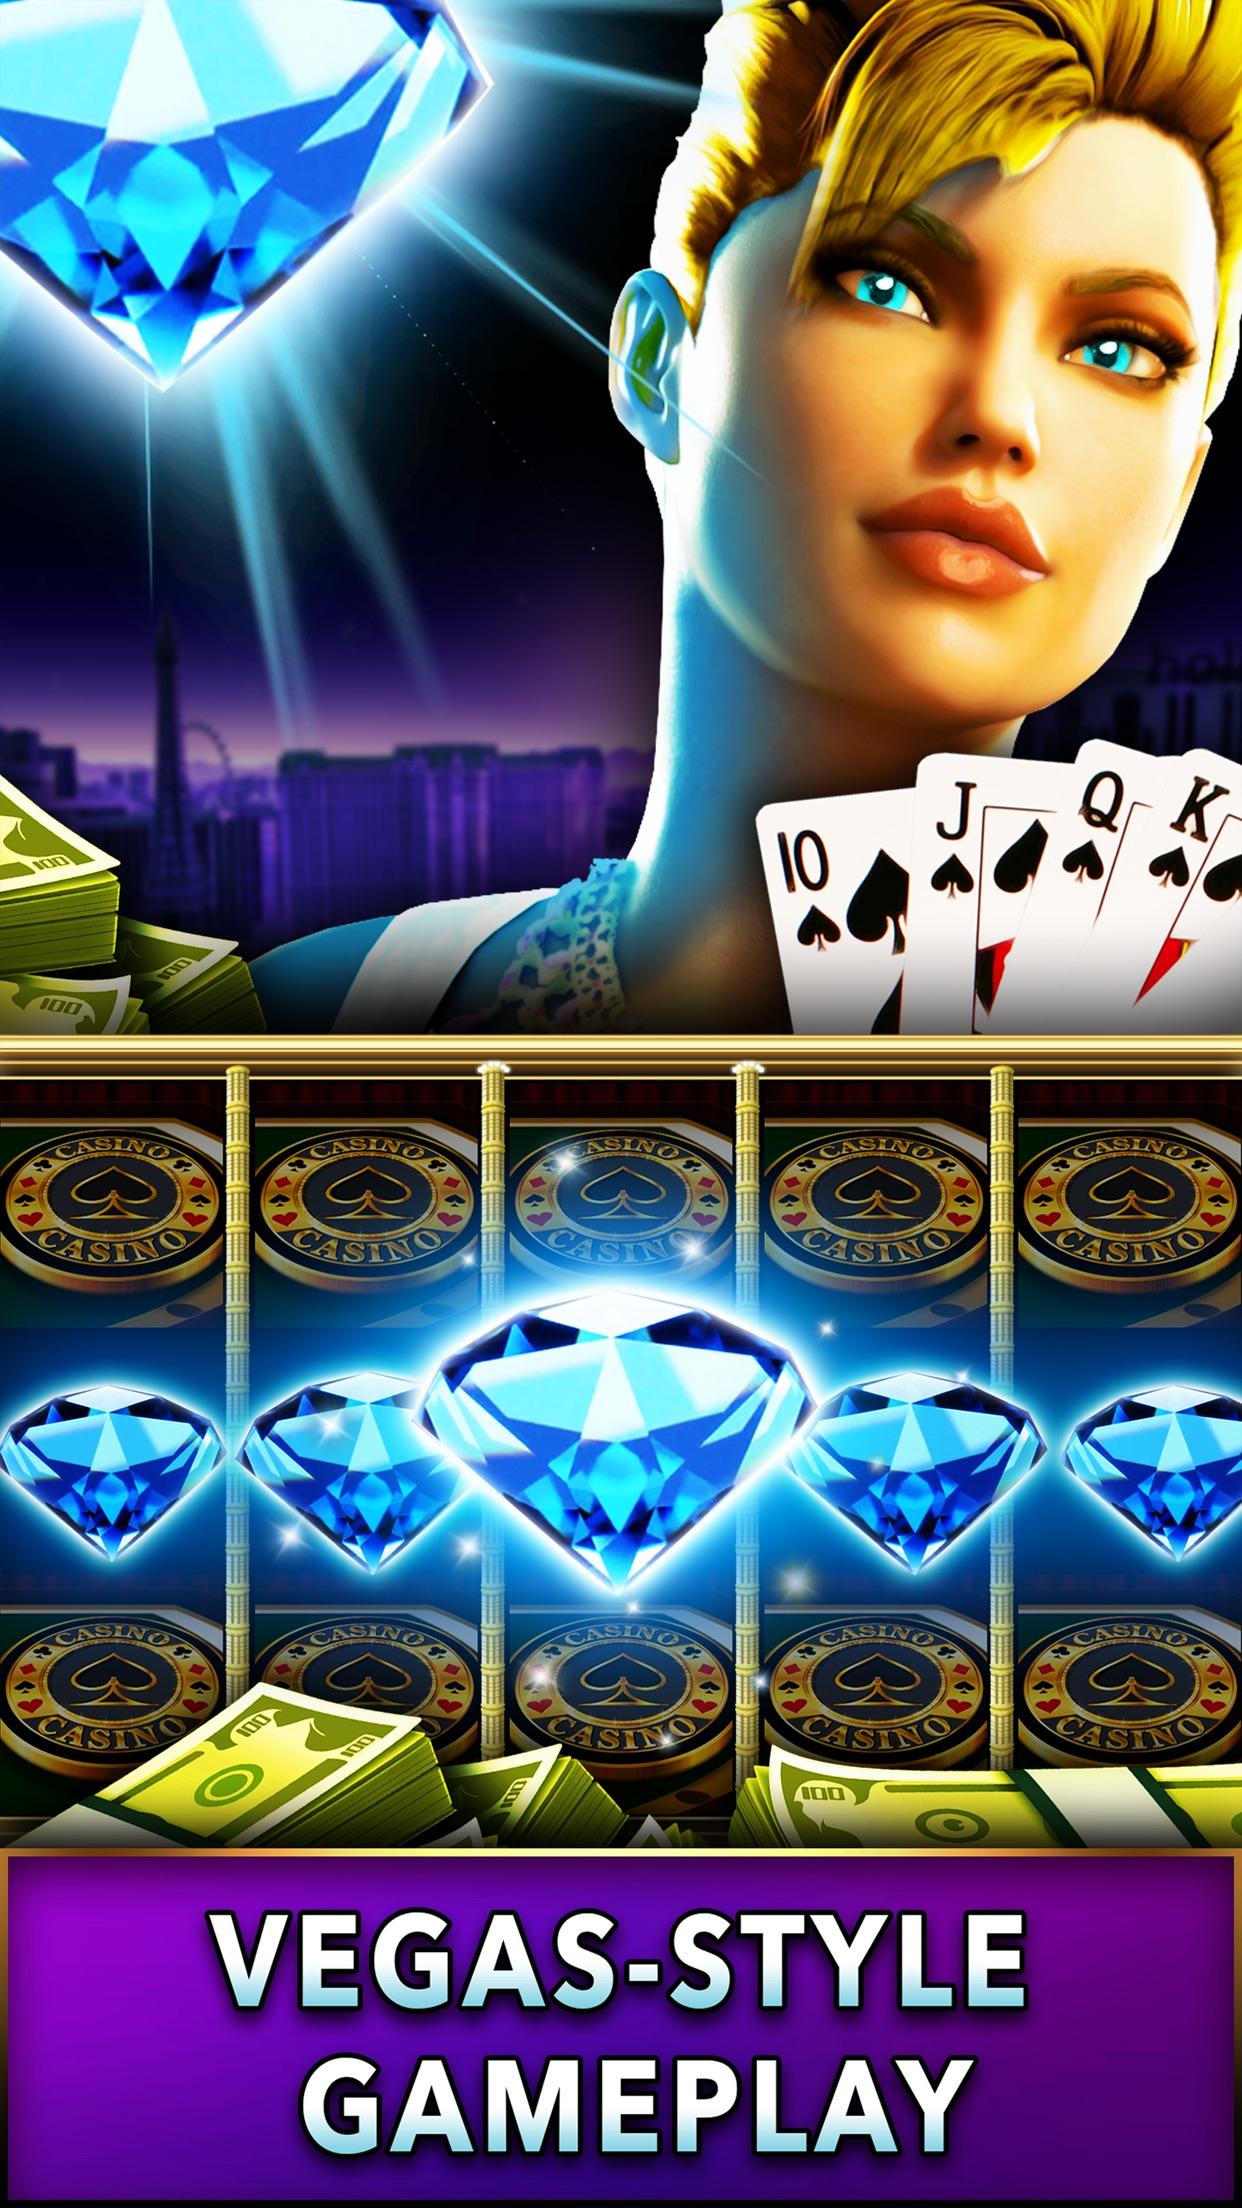 Mega Millions Casino - Real Vegas Slots - Play Royal Slot Machine Games in the Red Rock Valley! Screenshot